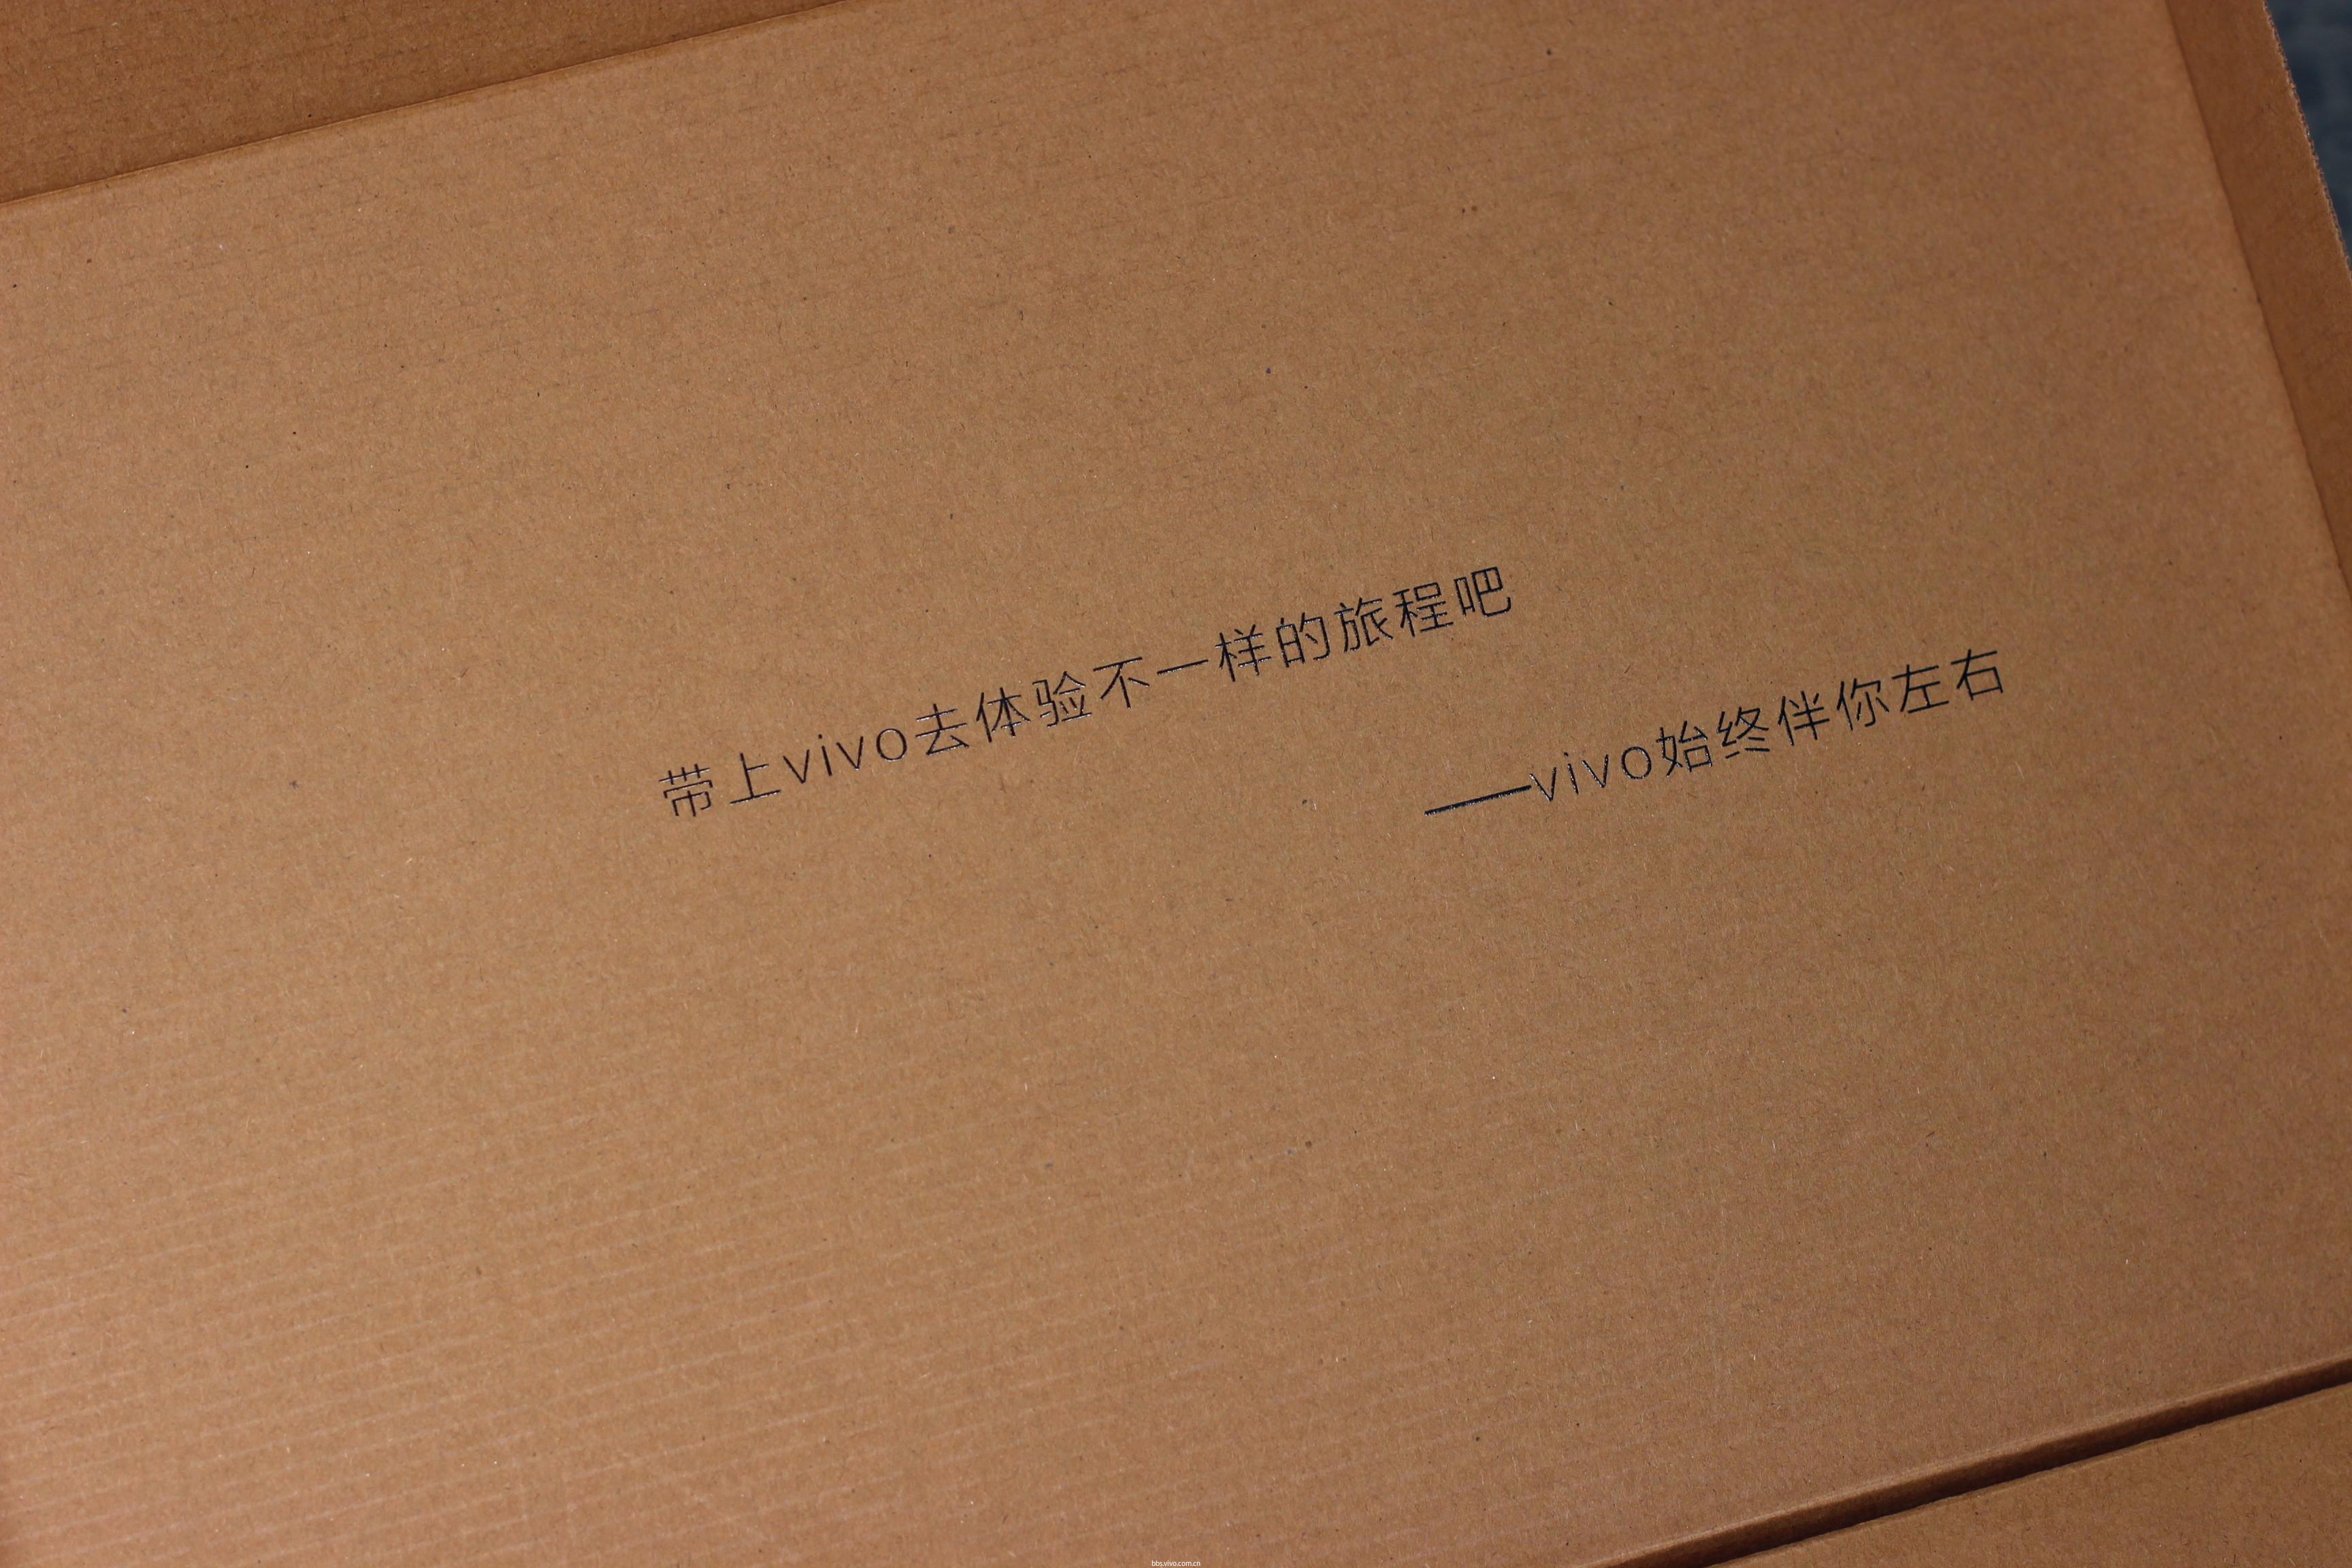 IMG_6964_副本.jpg